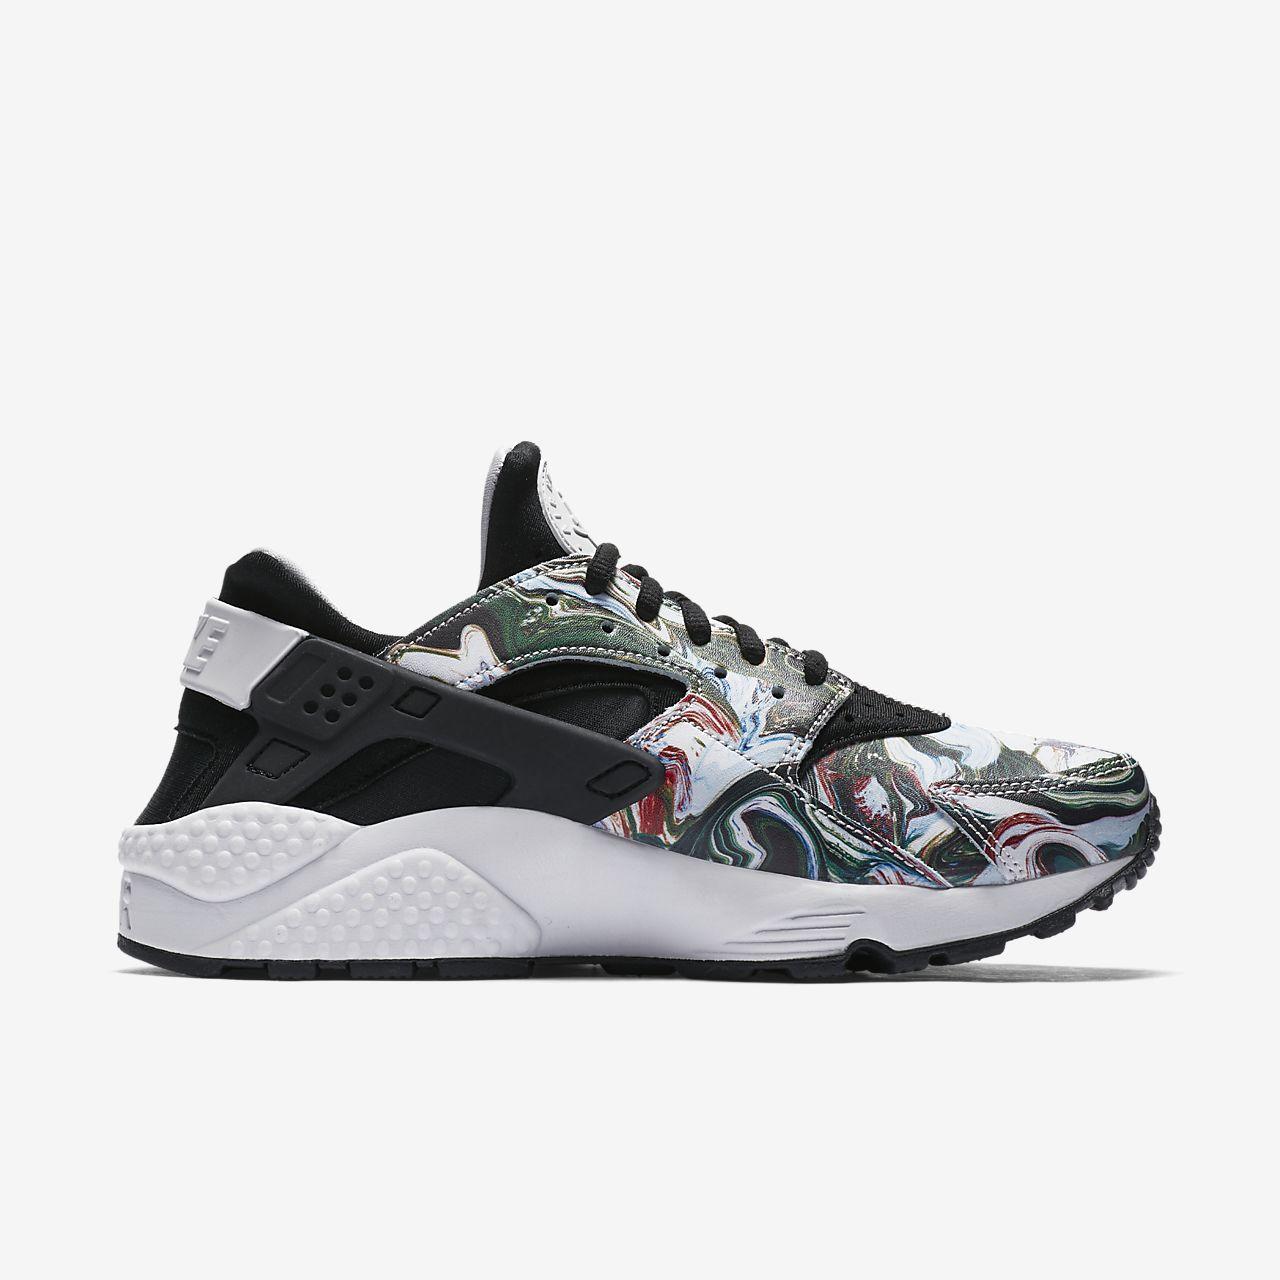 ... Nike Air Huarache Premium Marble Women's Shoe